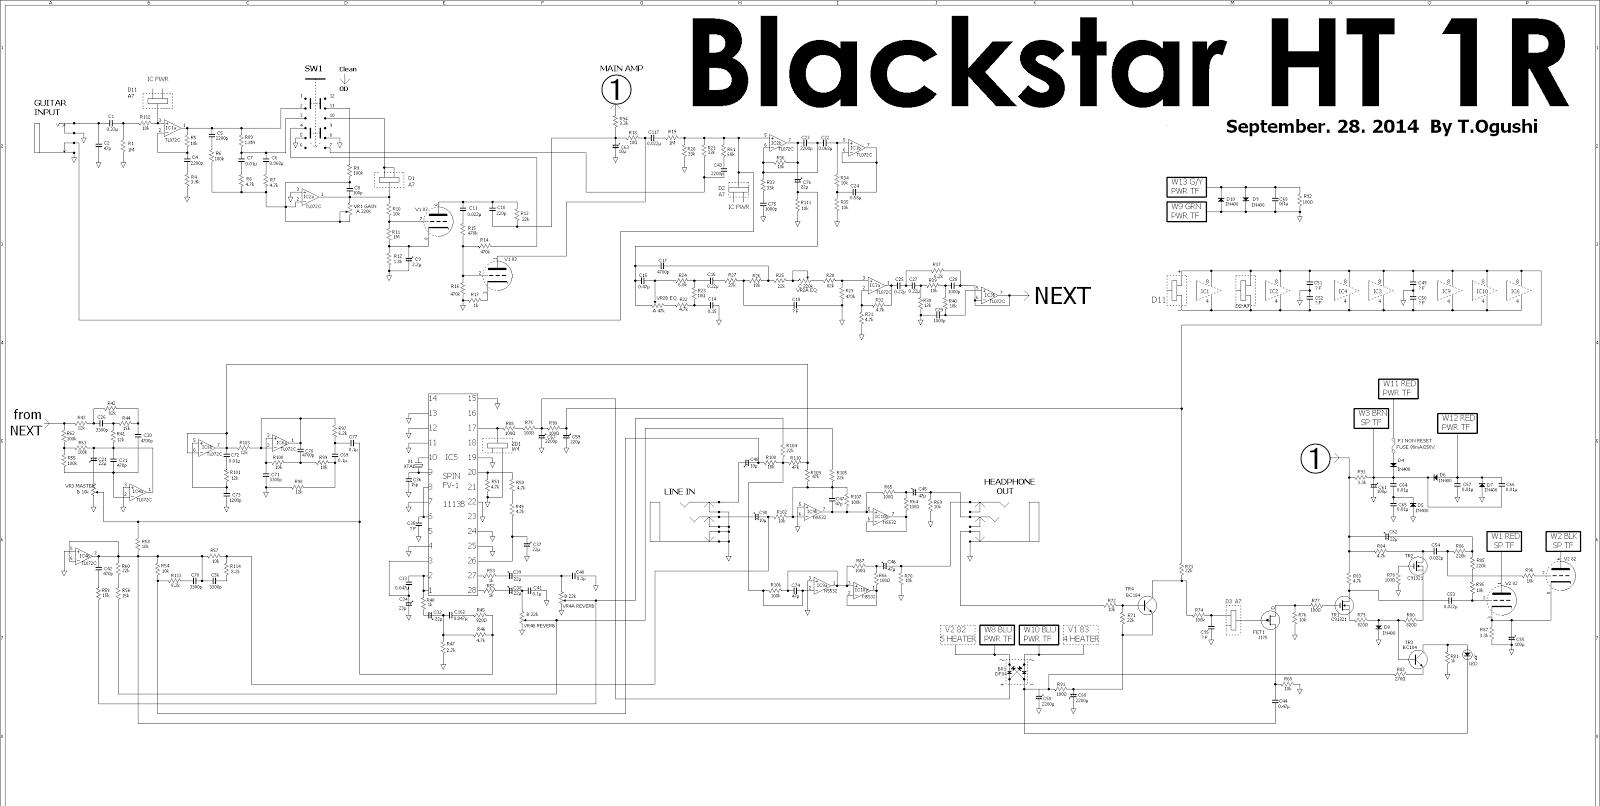 medium resolution of ht wiring diagram a96 btbw eastside it u2022 turbo 350 transmission rebuild diagram diagram h t